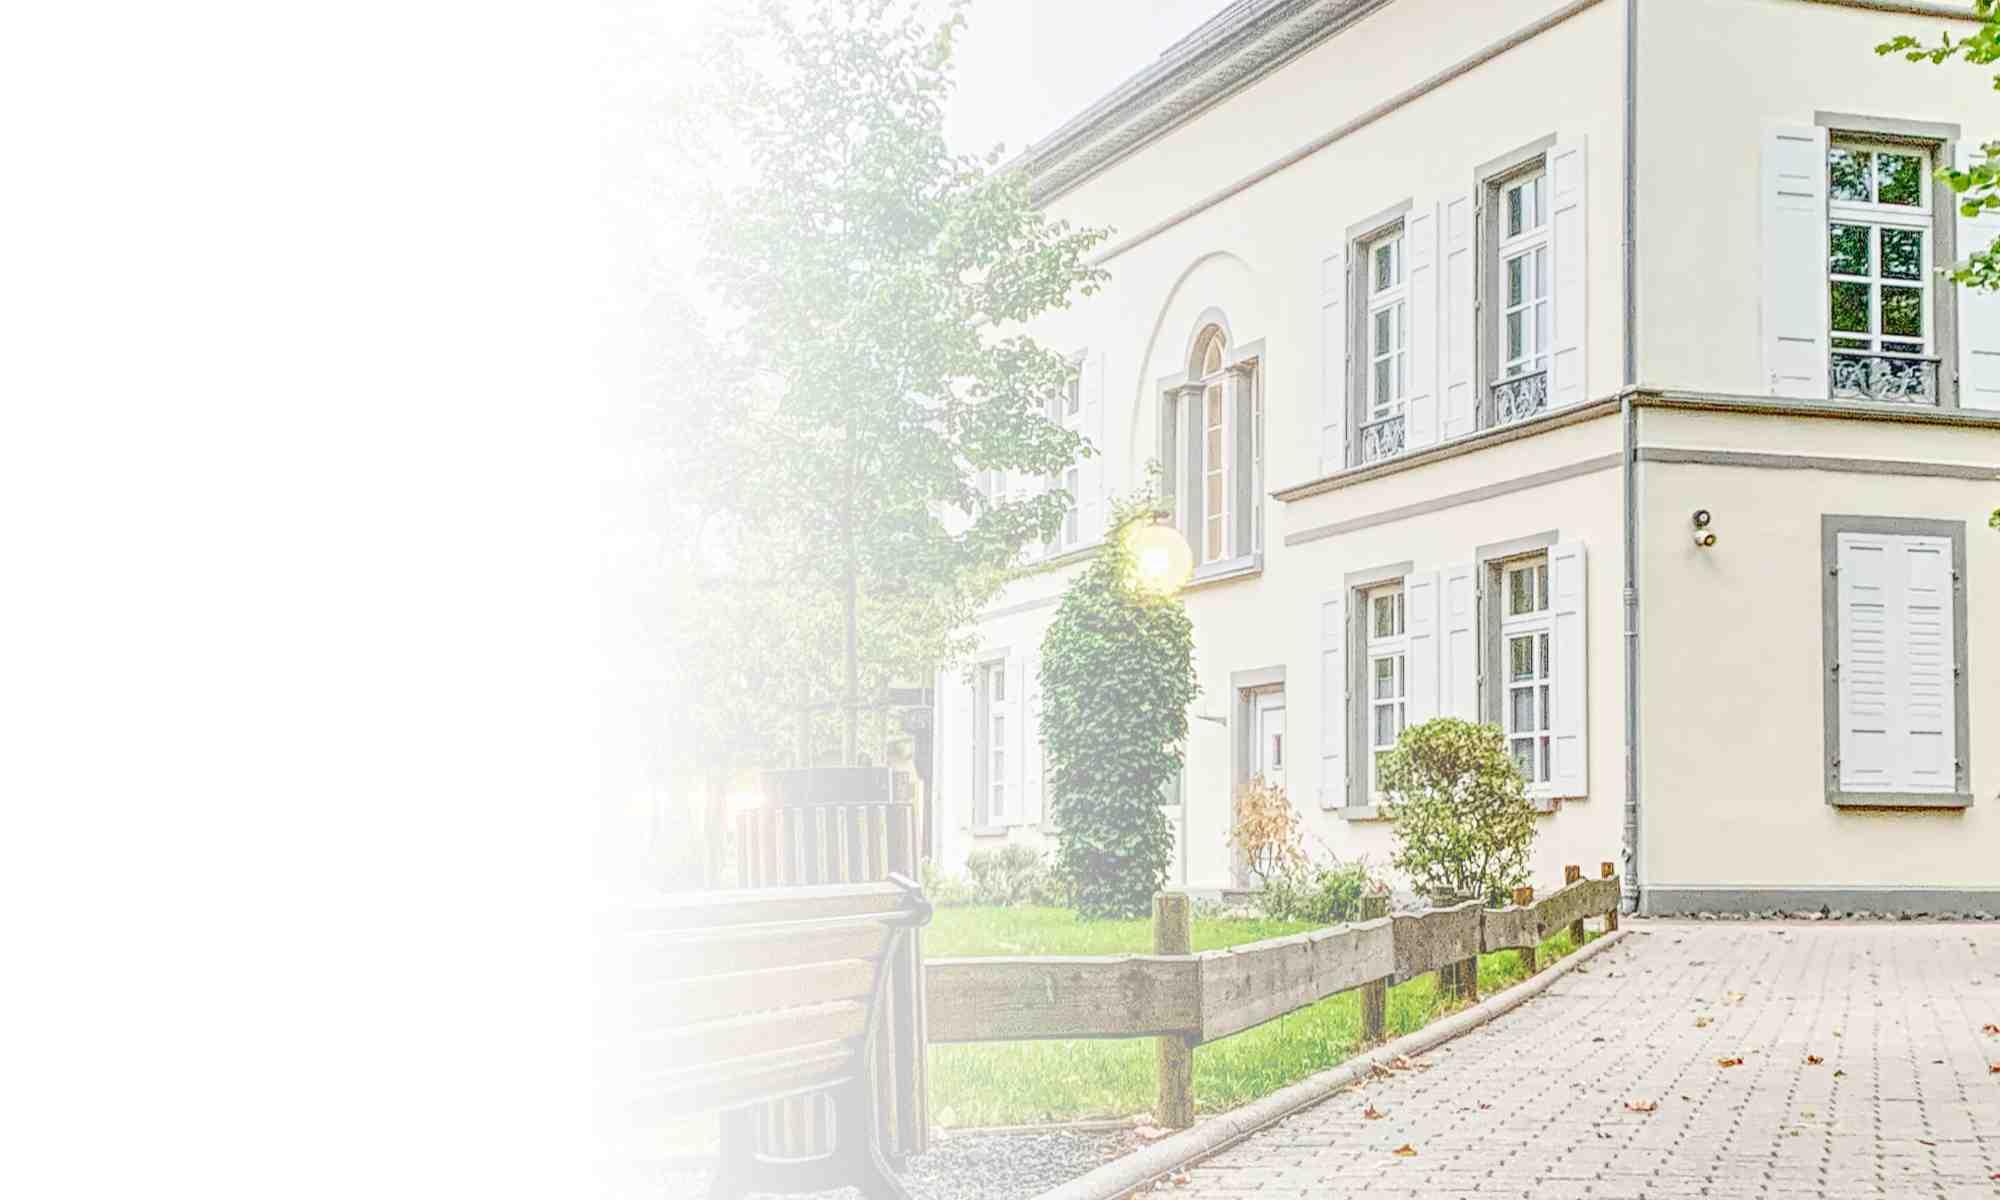 Kurfürst-Balduin-Gymnasium Münstermaifeld